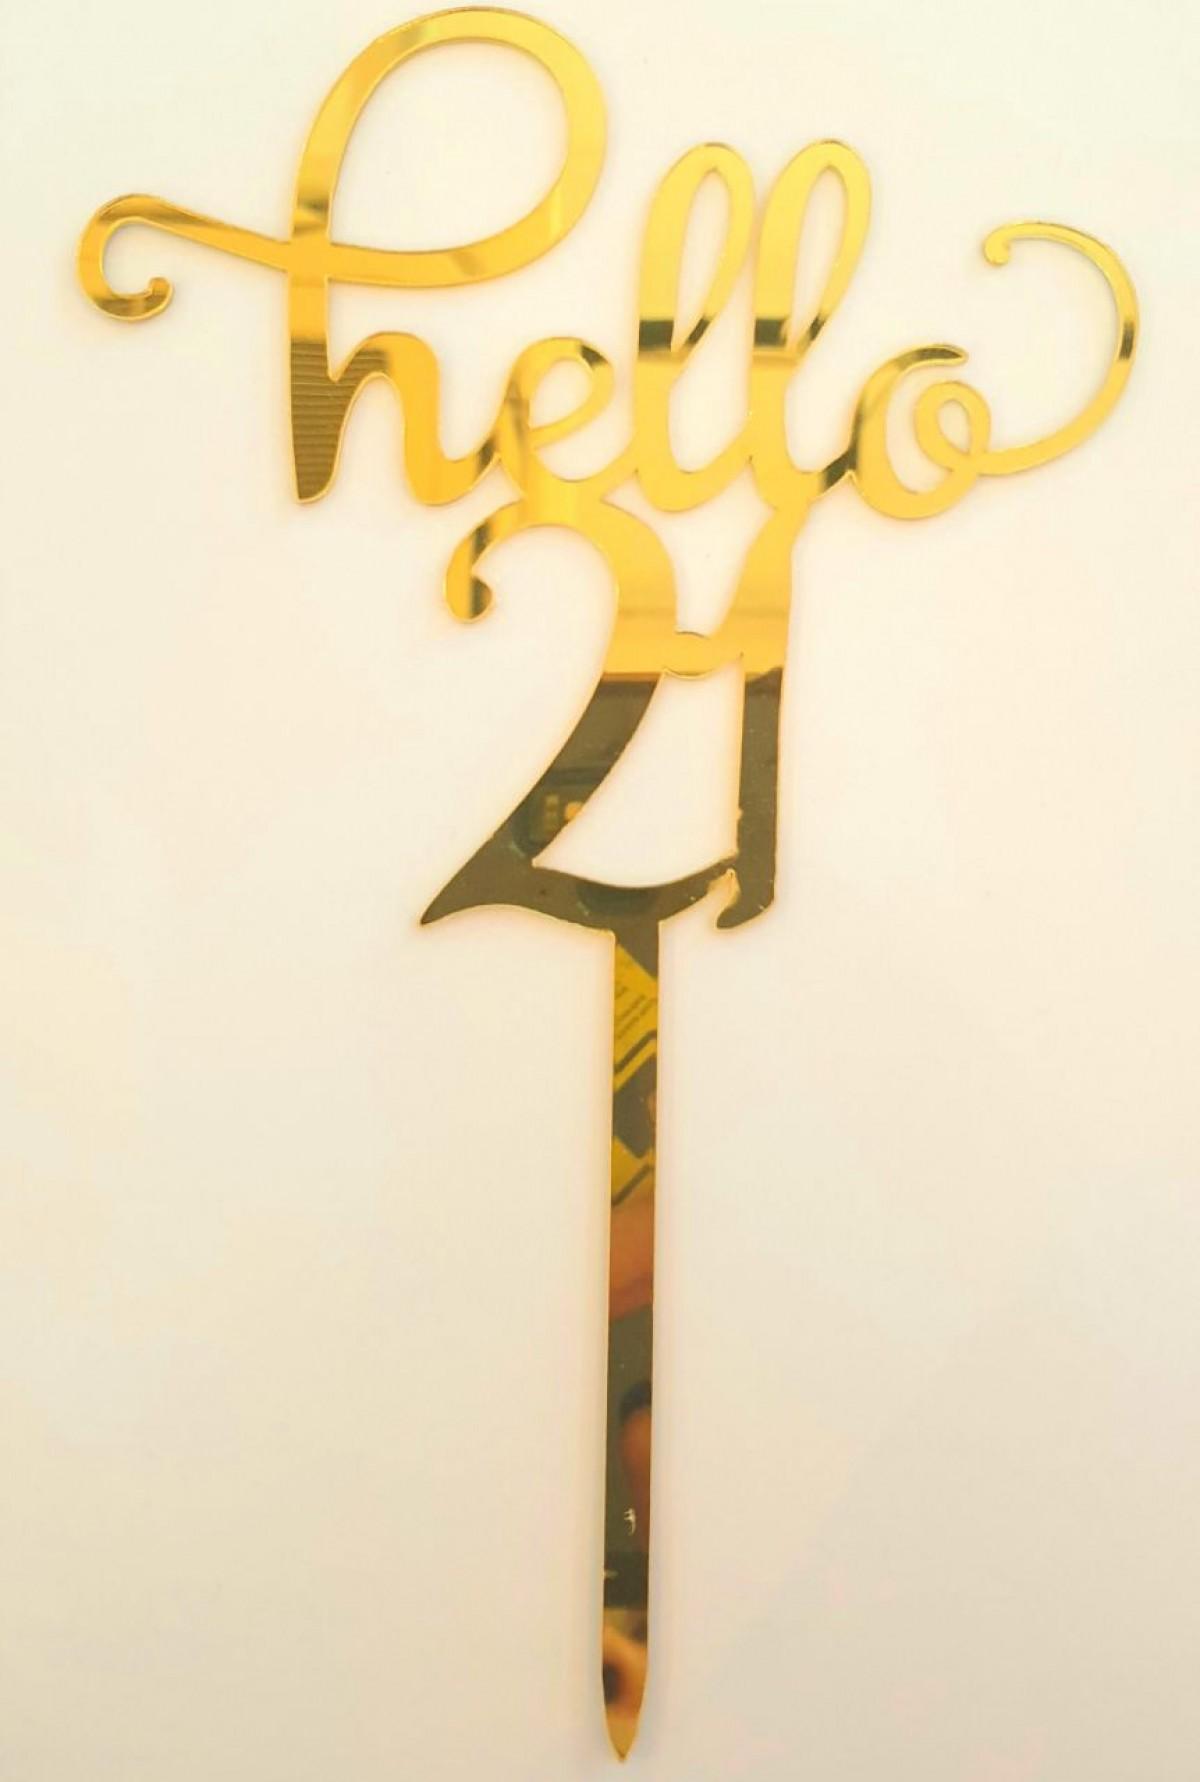 TOPPER HELLO (NUMBER) - RARA KITCHY